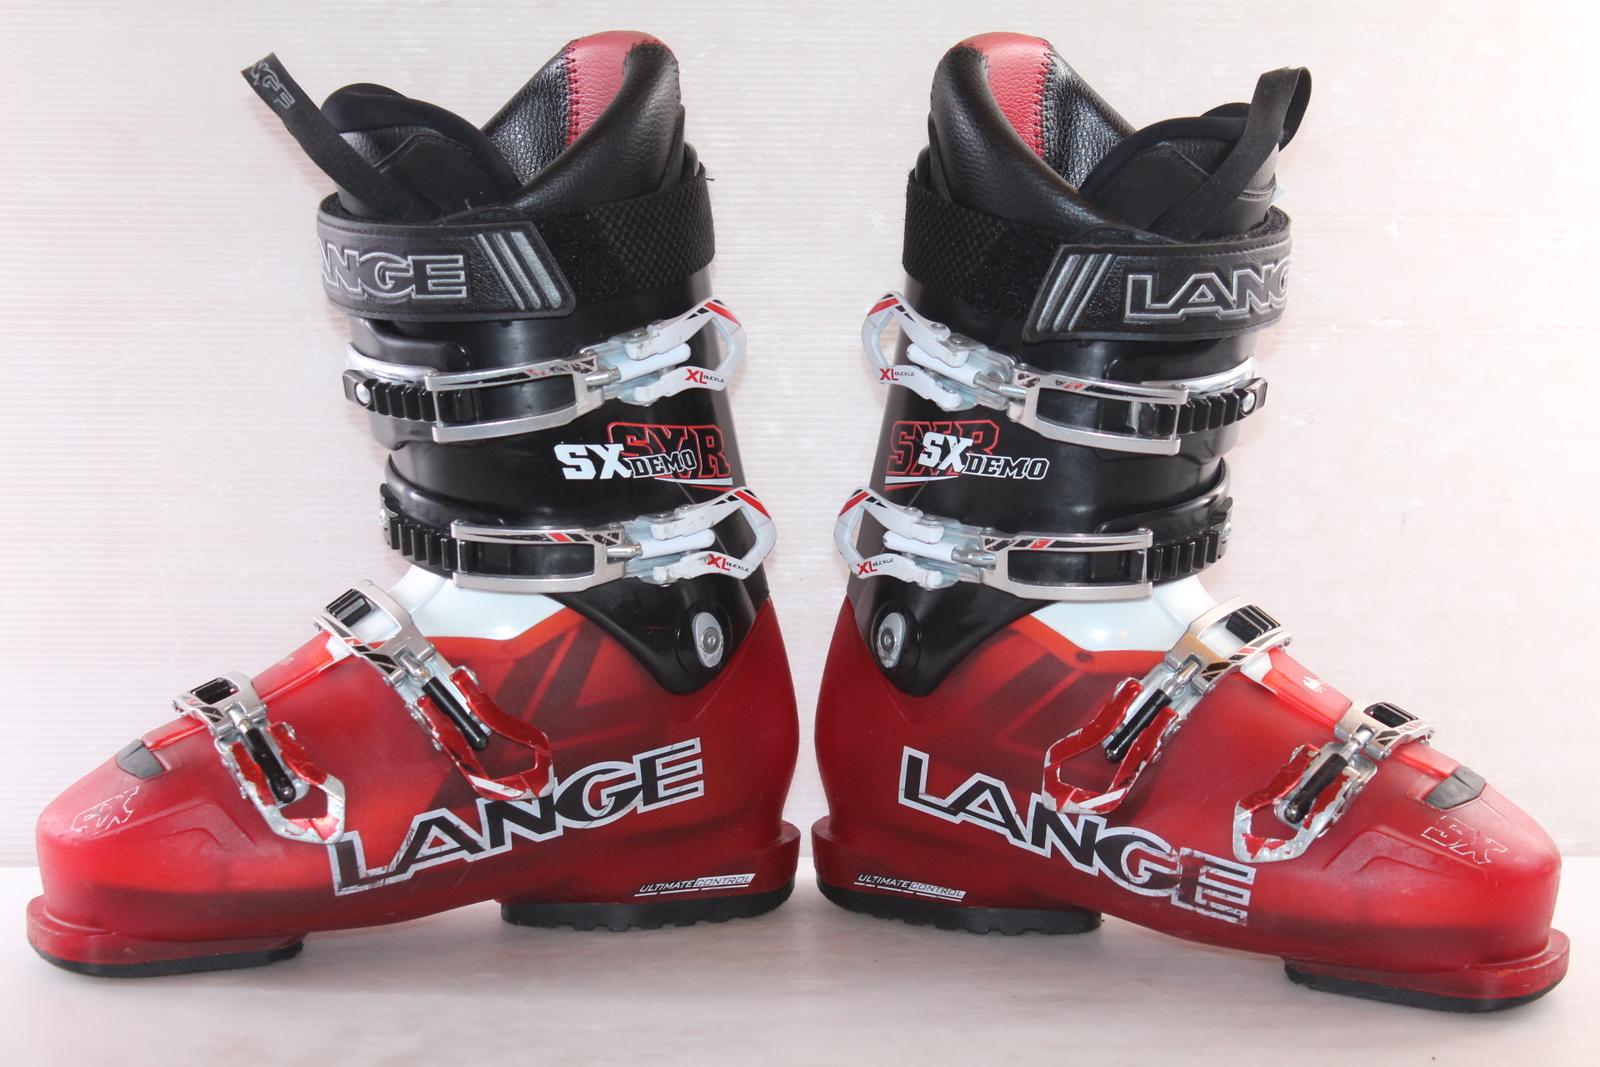 Lyžařské boty Lange Demo SXR vel. EU41 flexe 85